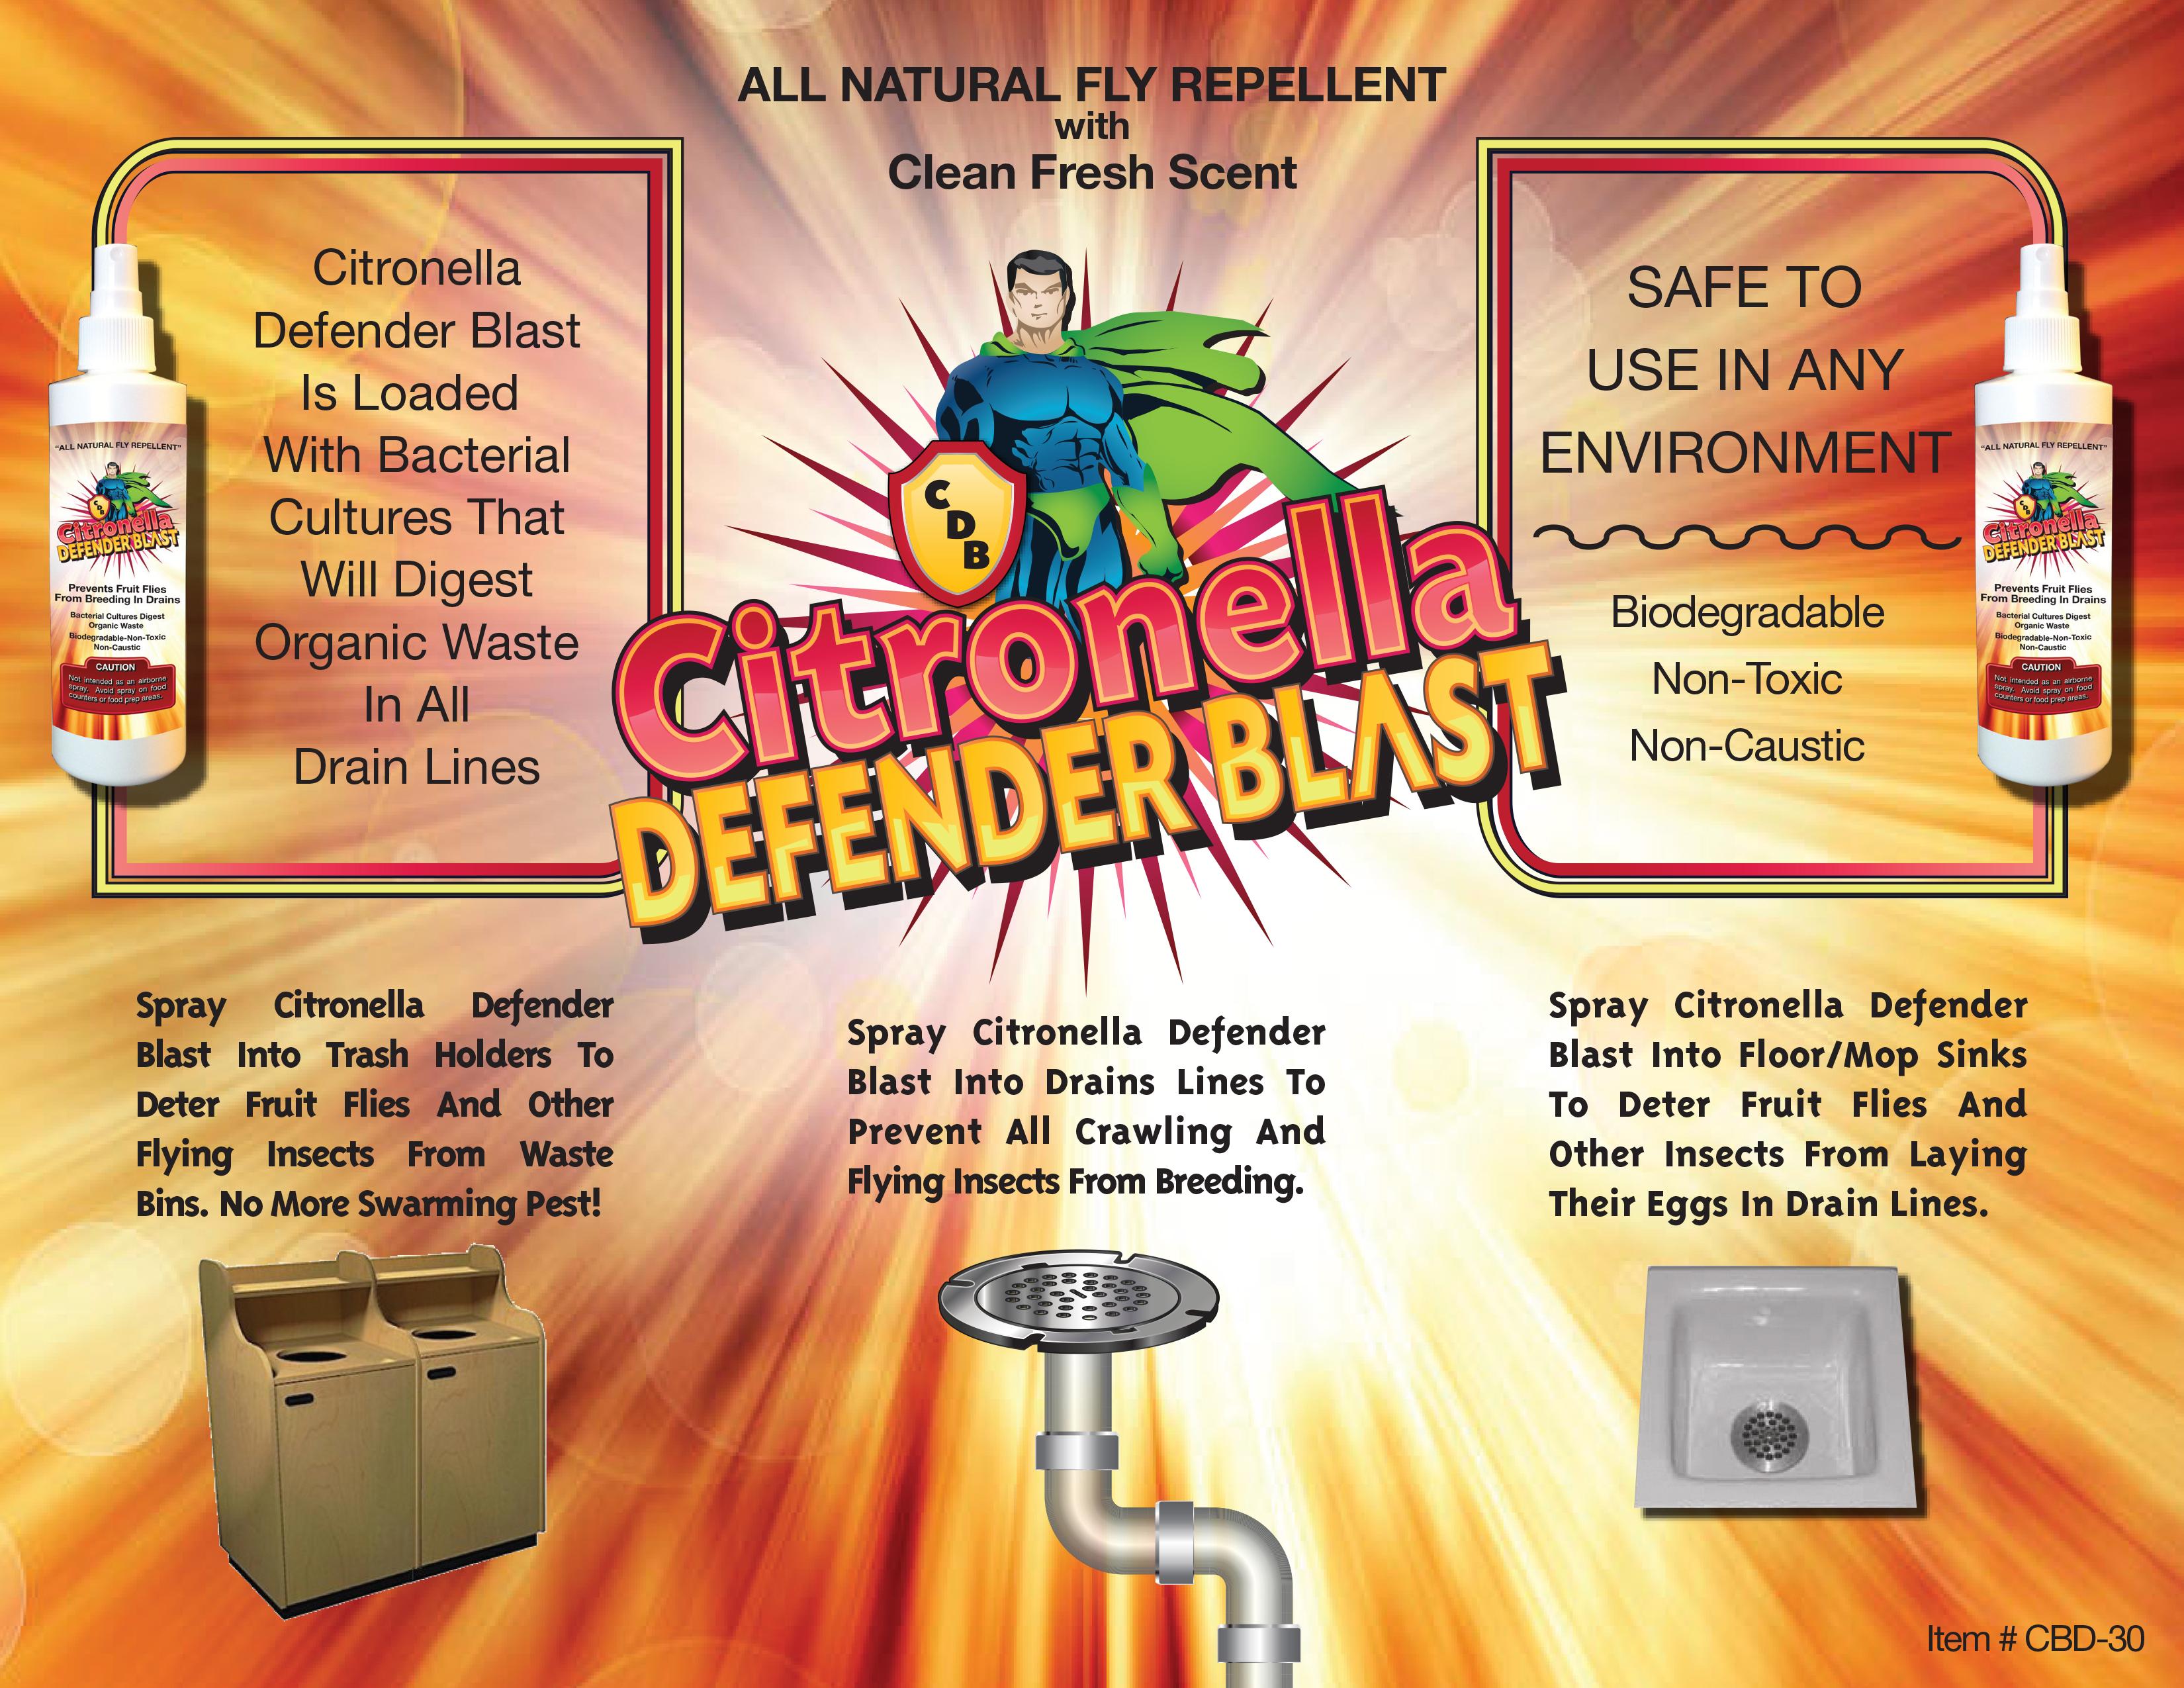 Citronella Defender Blast